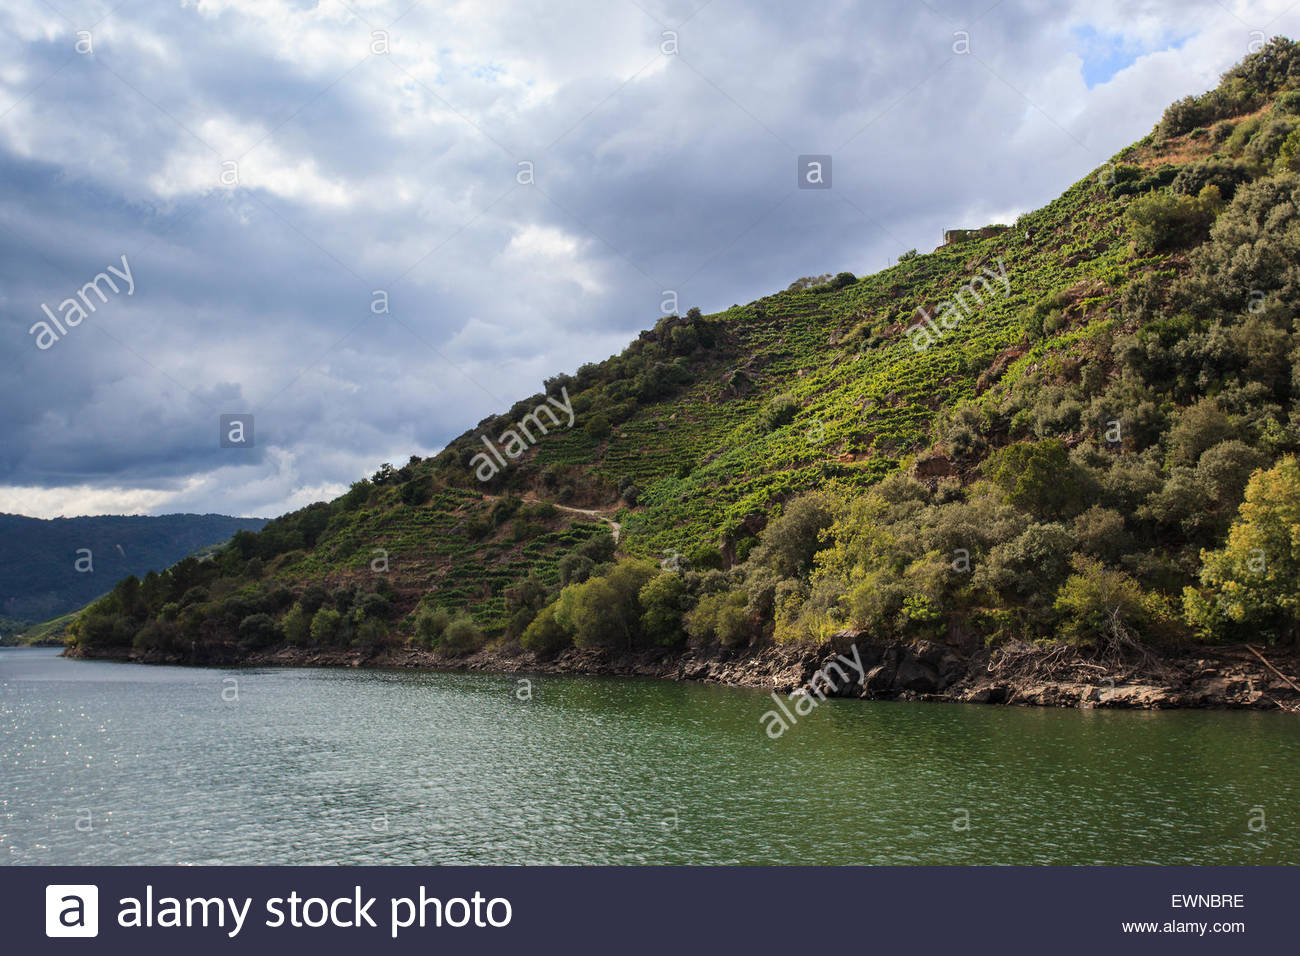 Ribeira Sacra vineyards in Galicia, Spain - Stock Image